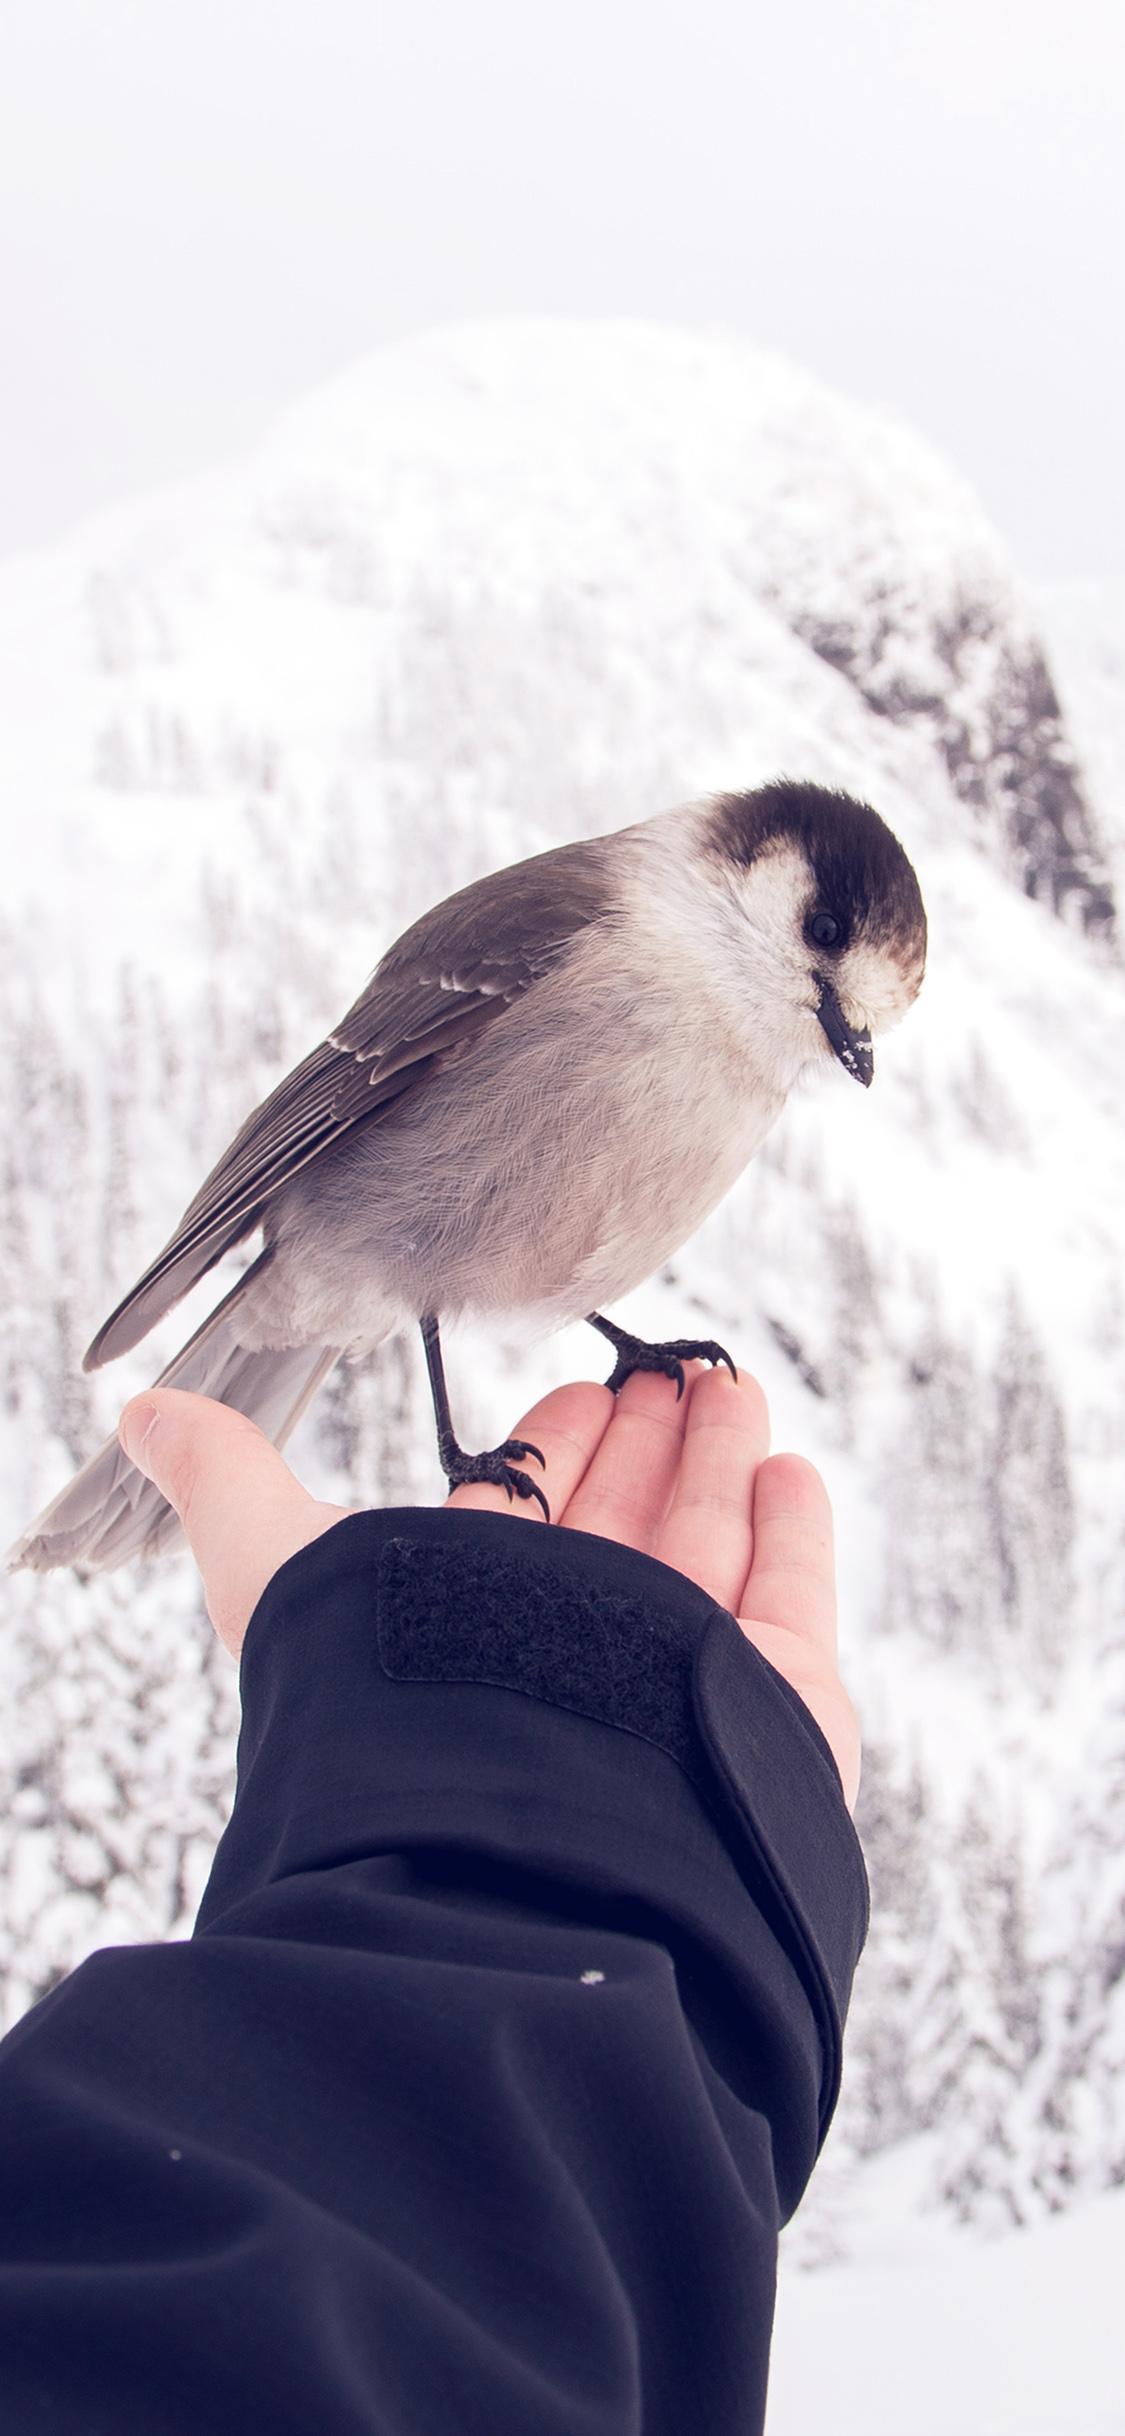 iPhoneXpapers.com-Apple-iPhone-wallpaper-nb92-bird-in-my-hand-snow-winter-cold-animal